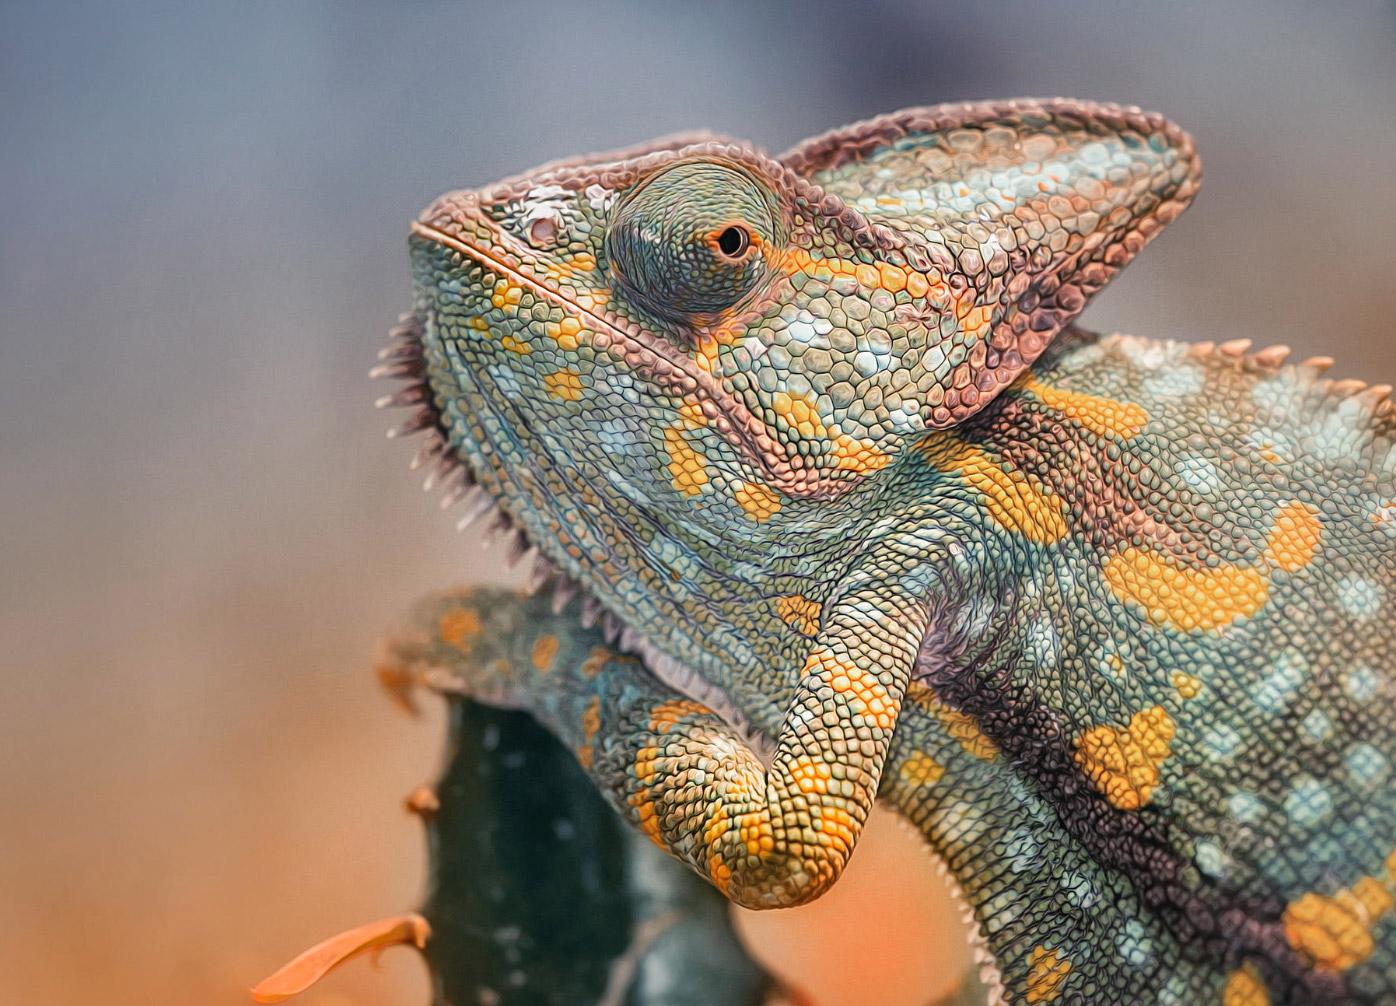 reptiles-amphibians-detlef-knapp-07